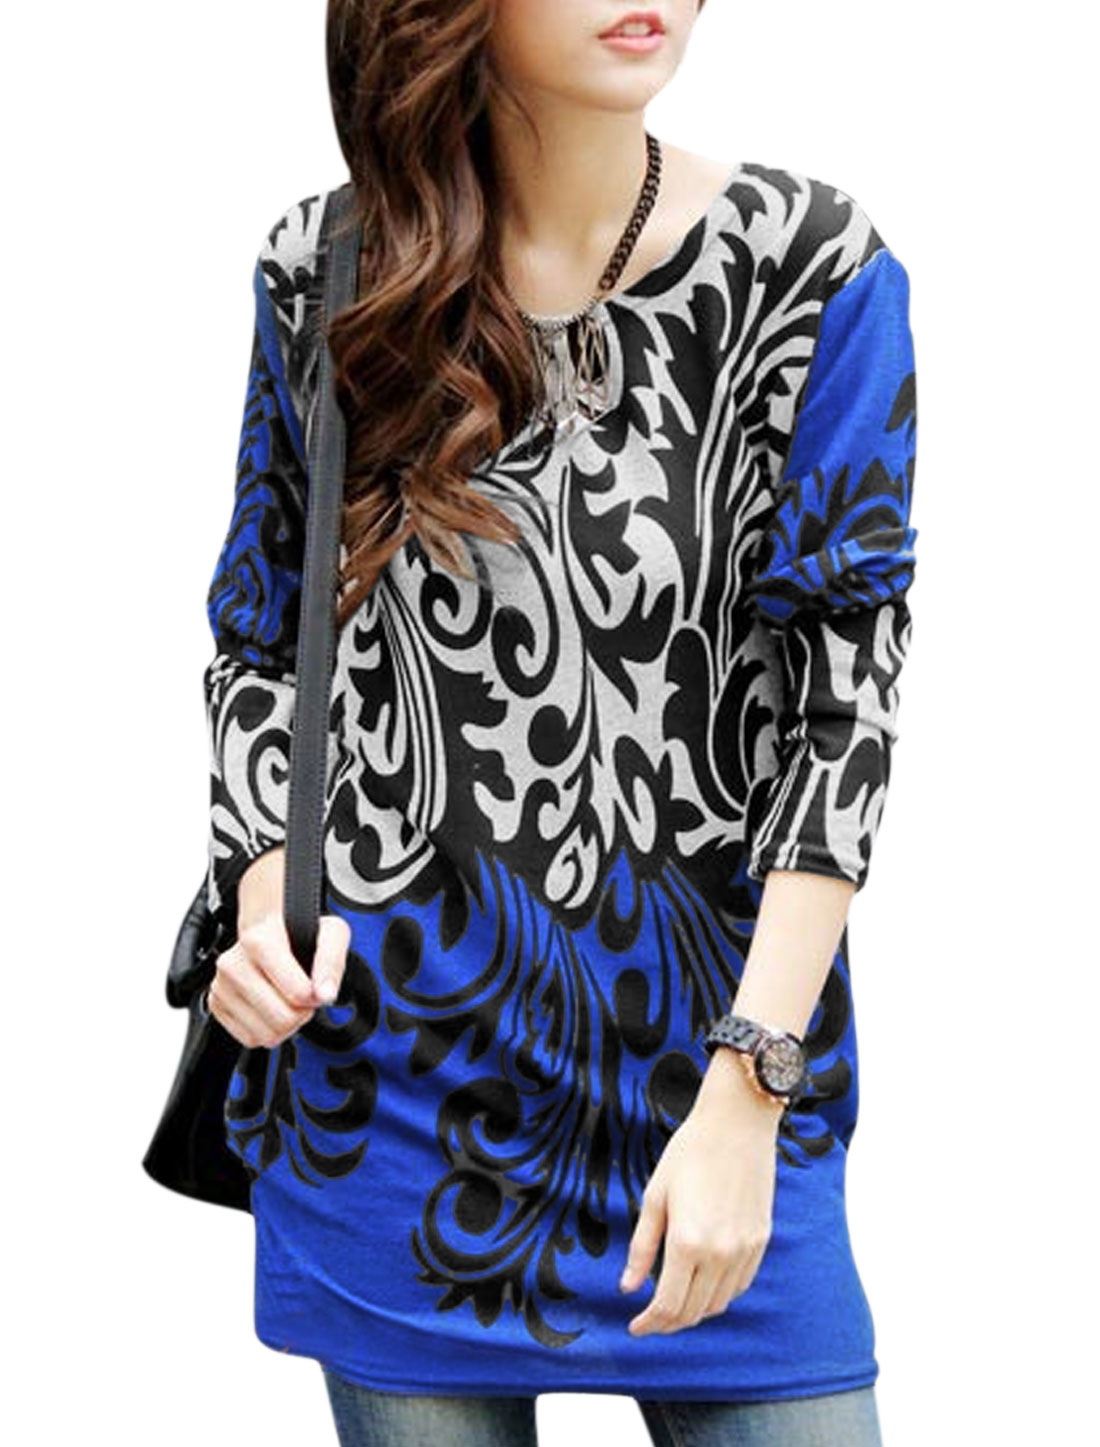 Women Jacquard Pattern Shirred Sides Tunic Knit Shirt Blue Black S